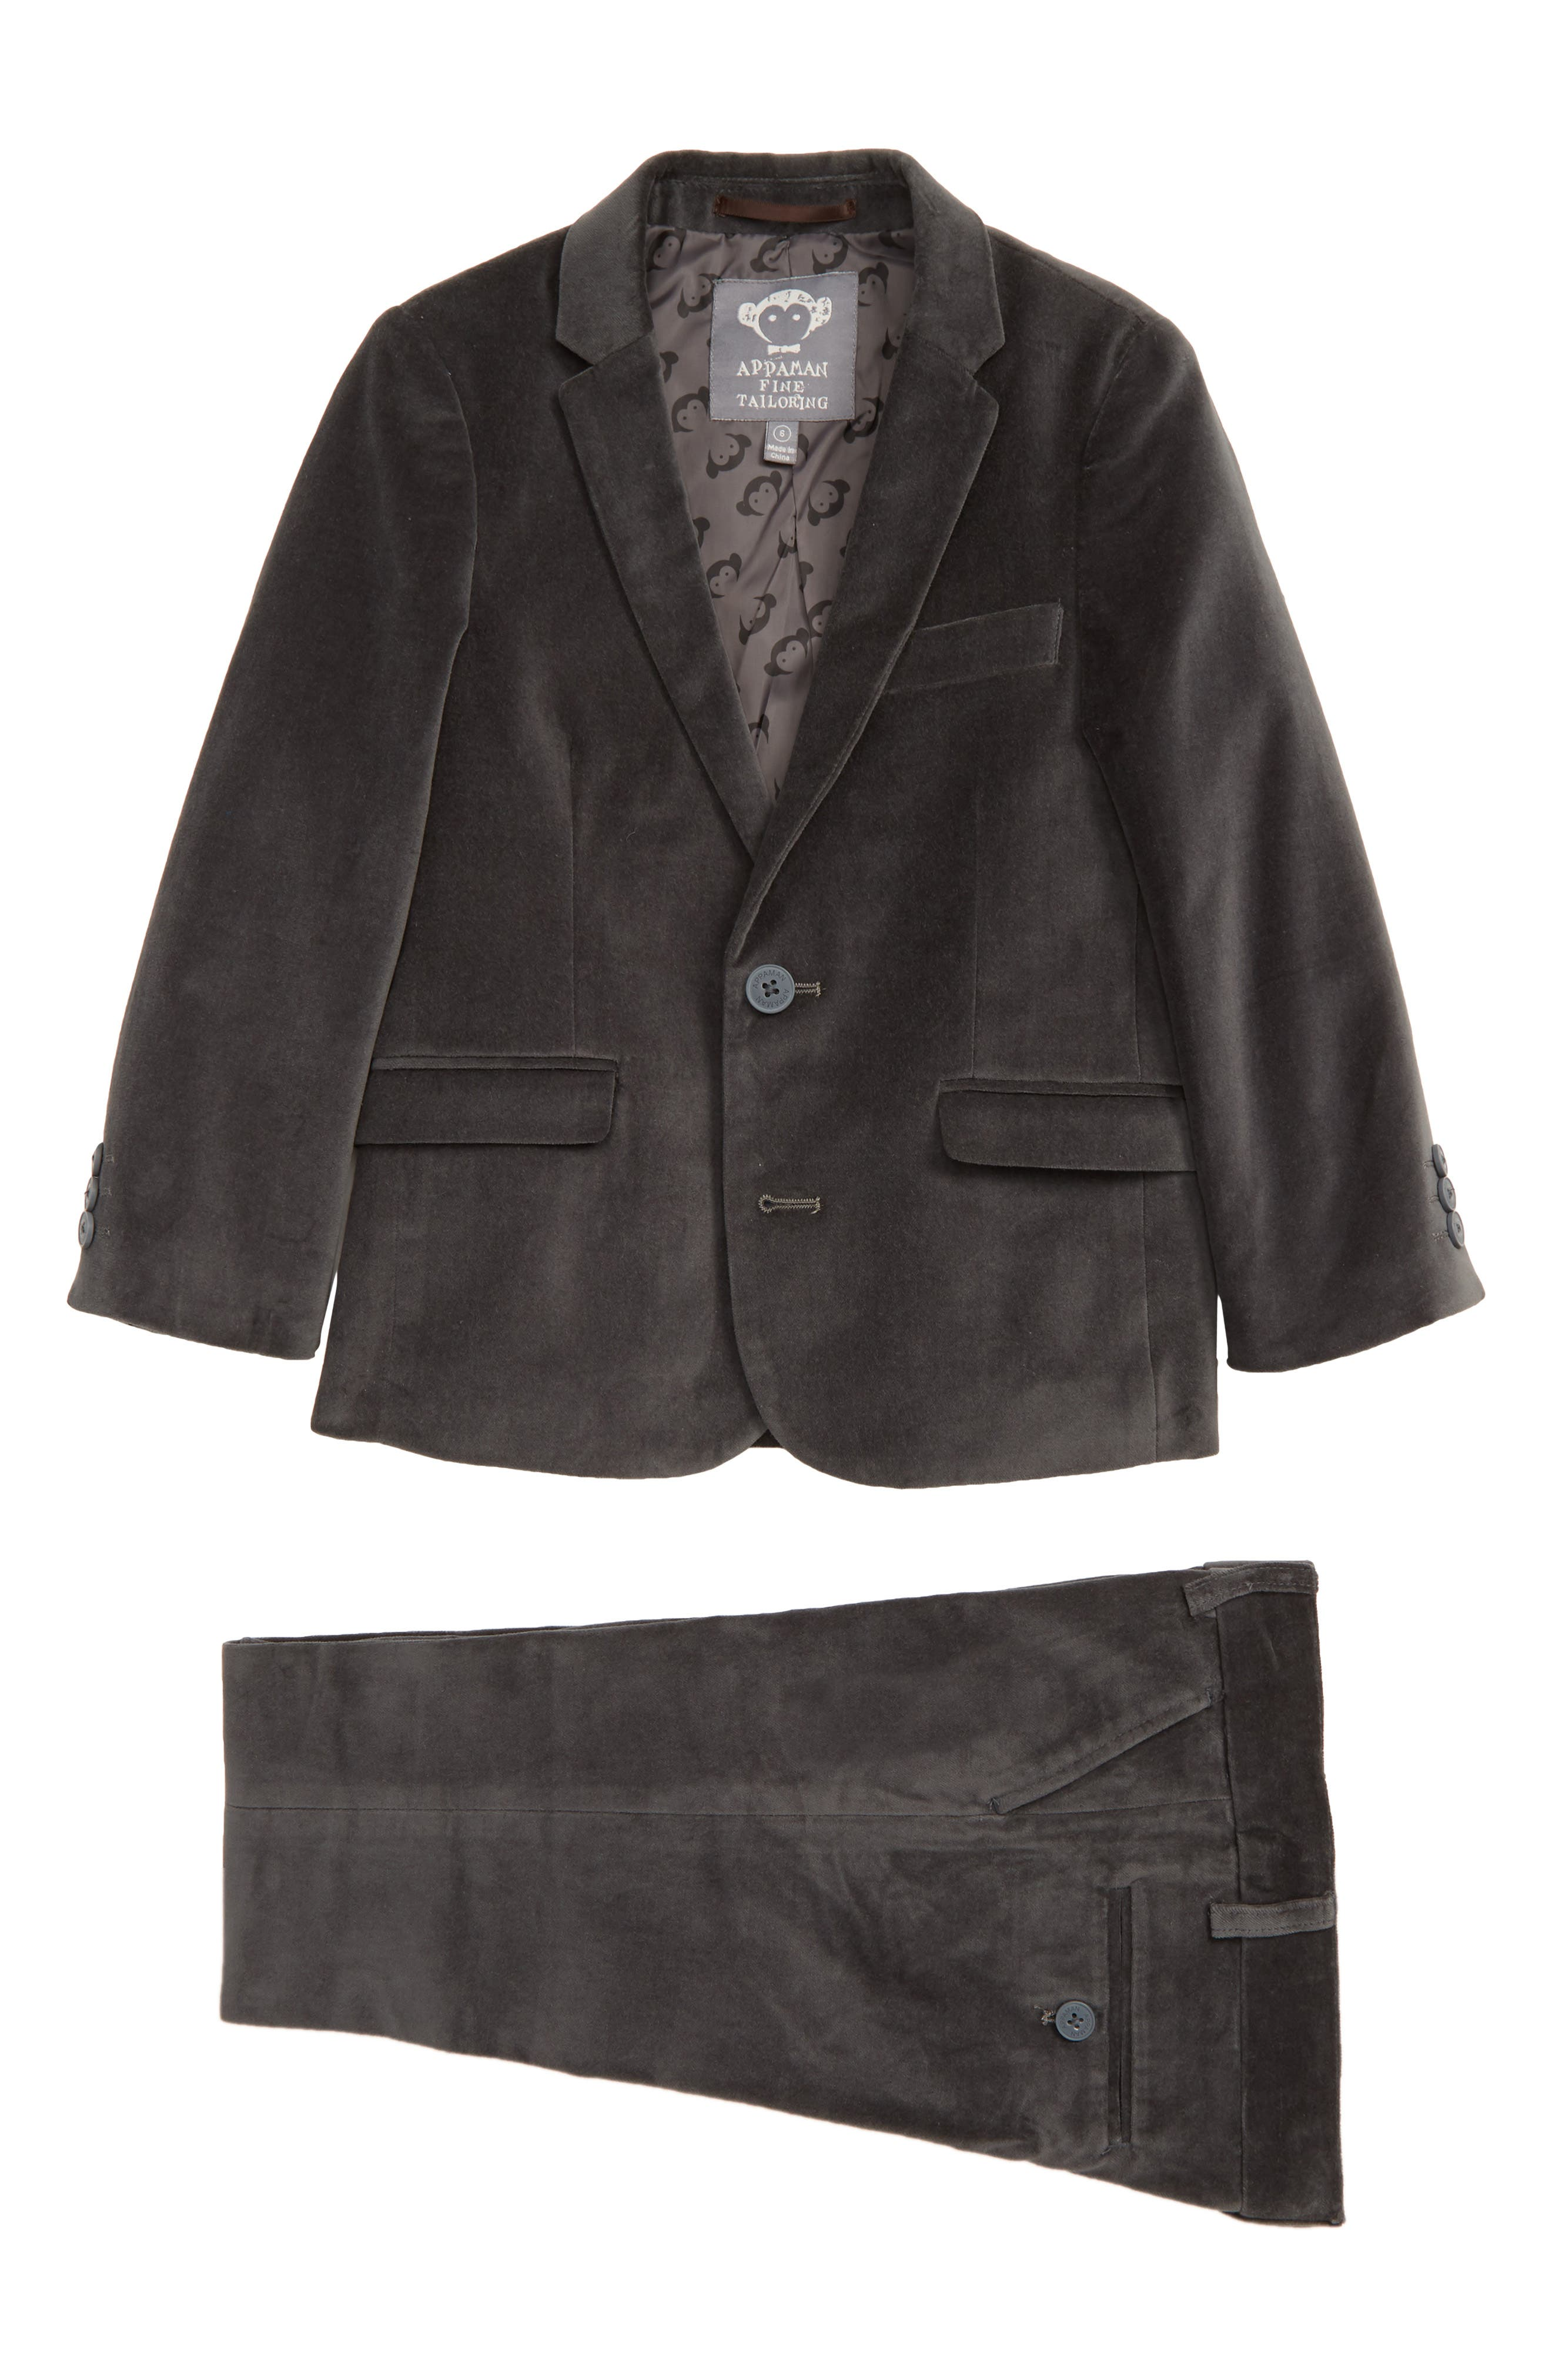 Mod Velvet Suit,                         Main,                         color, VINTAGE BLACK VELVET